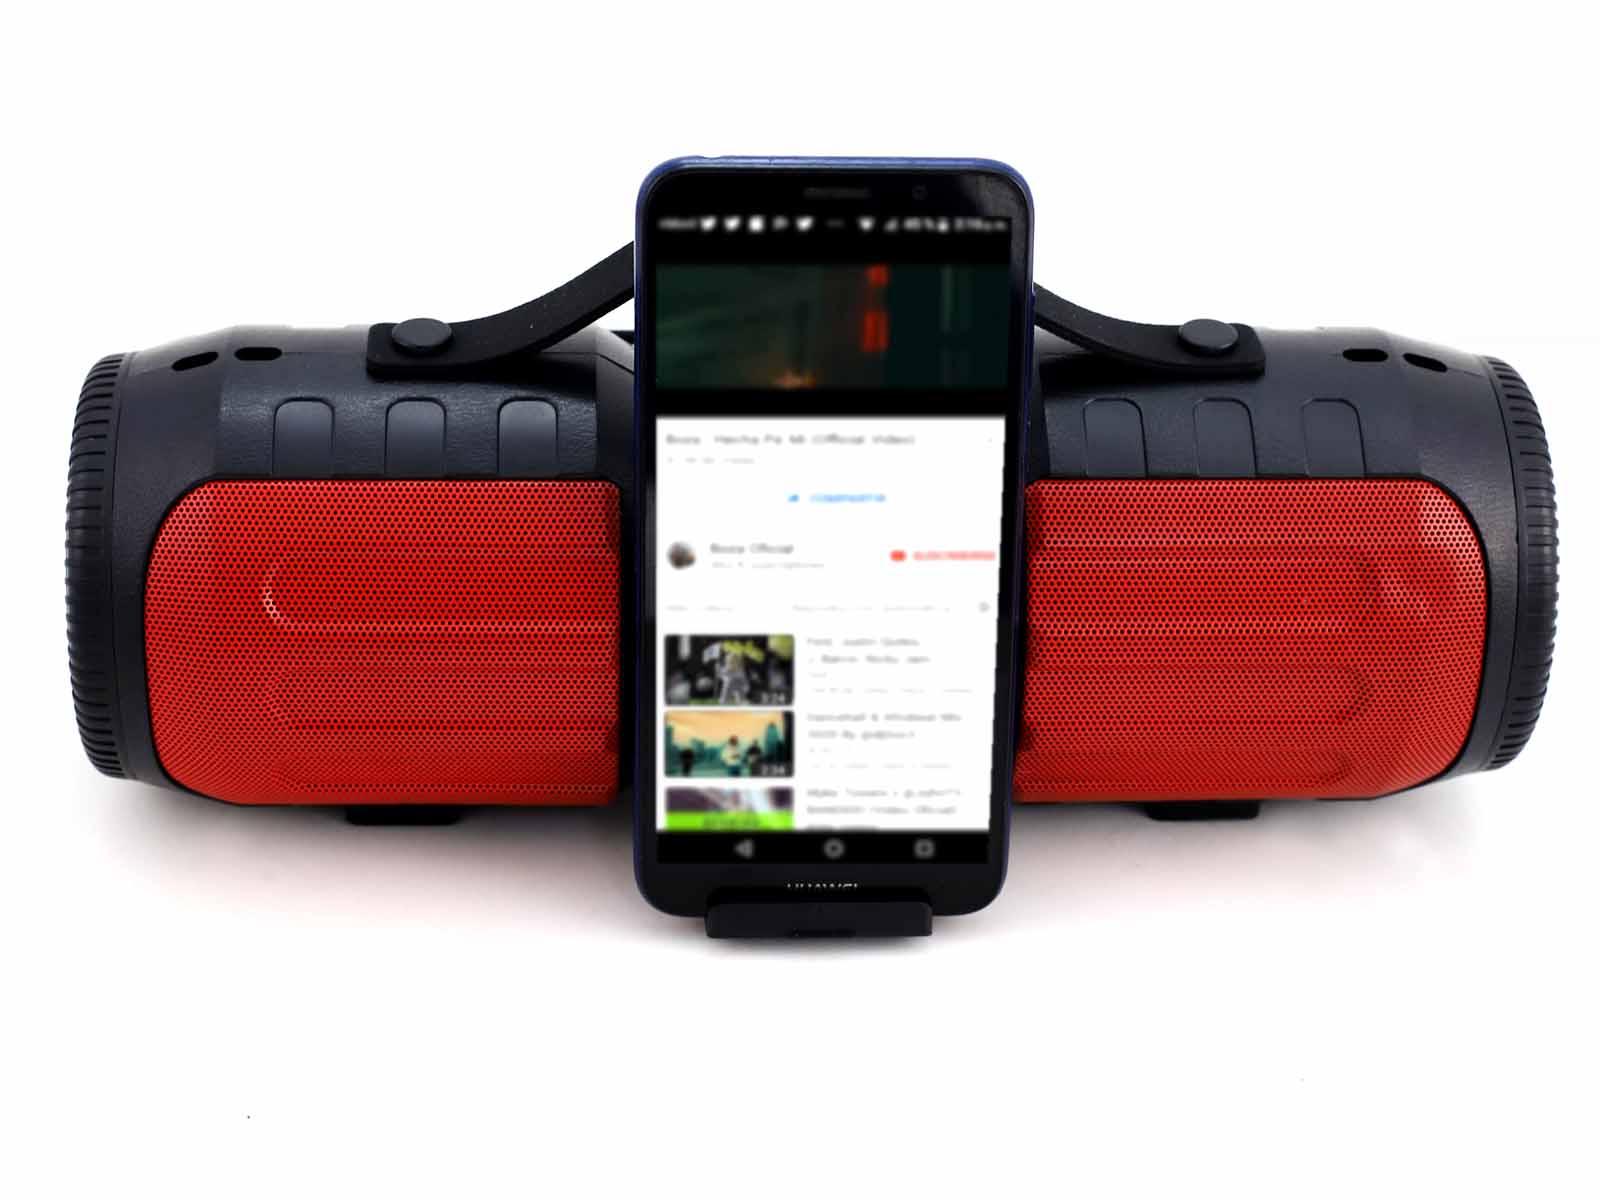 Imagen de producto Parlante portatil multimedia con bateria recargable 2